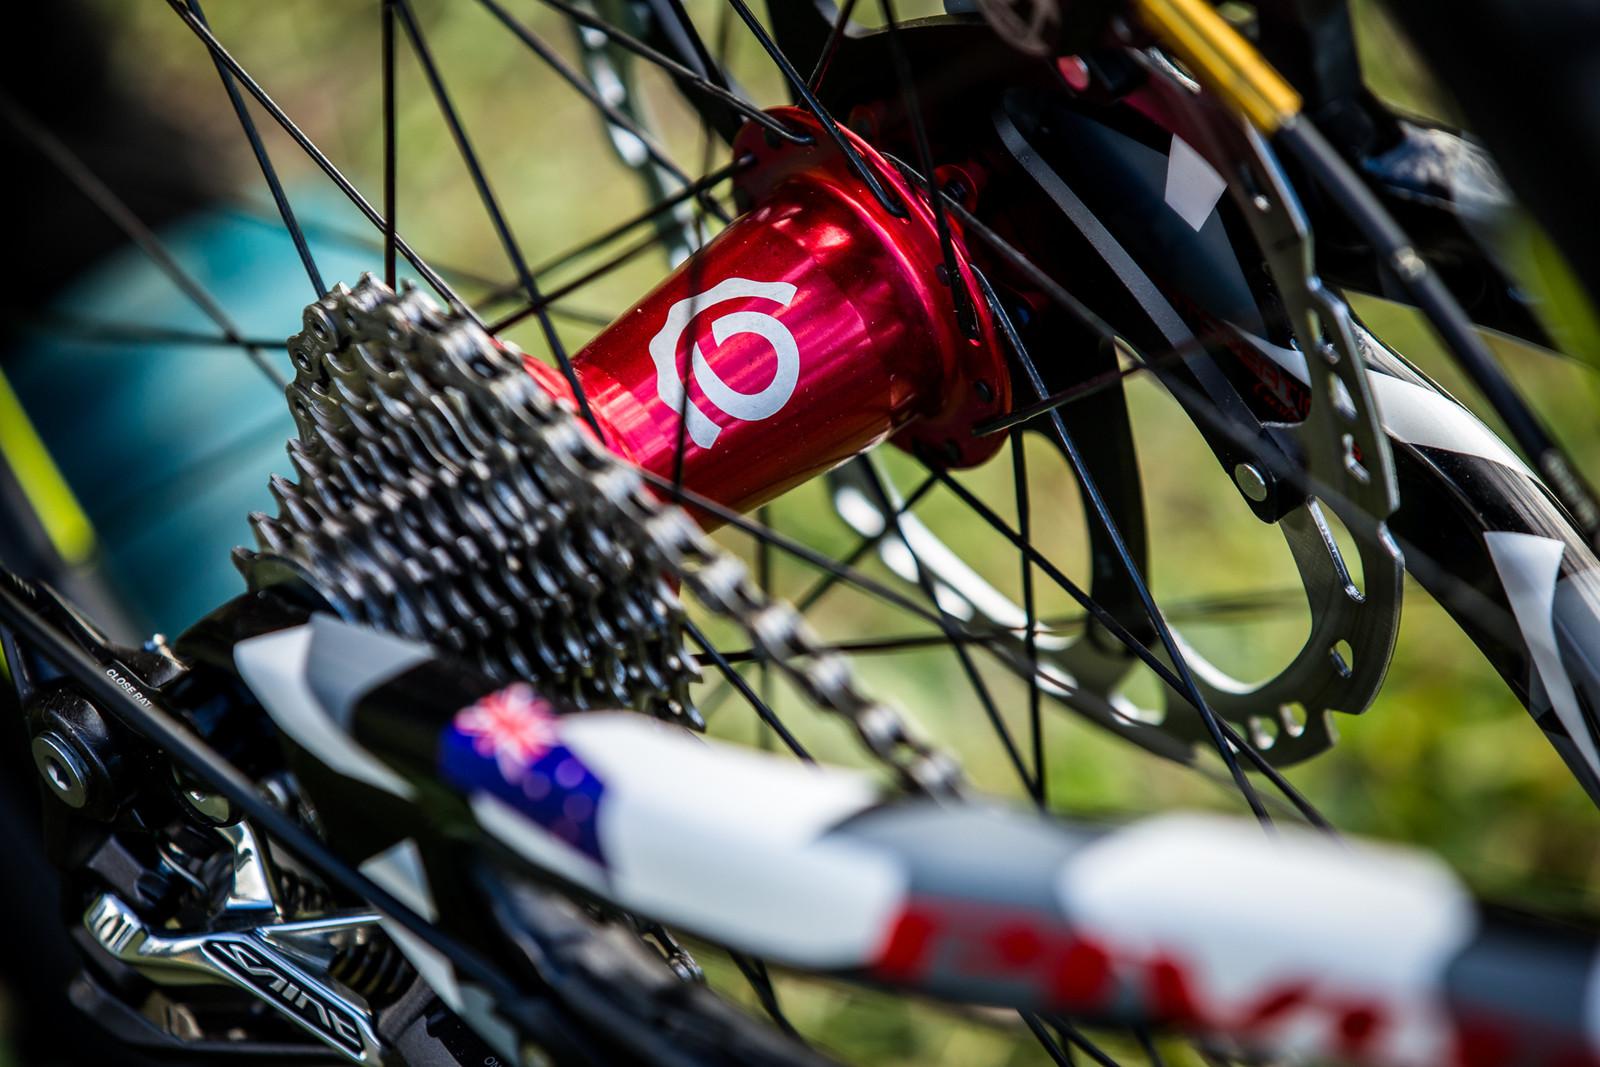 I9 Bling - WORLD CHAMPS BIKE - Eddie Masters' Pivot Phoenix - Mountain Biking Pictures - Vital MTB